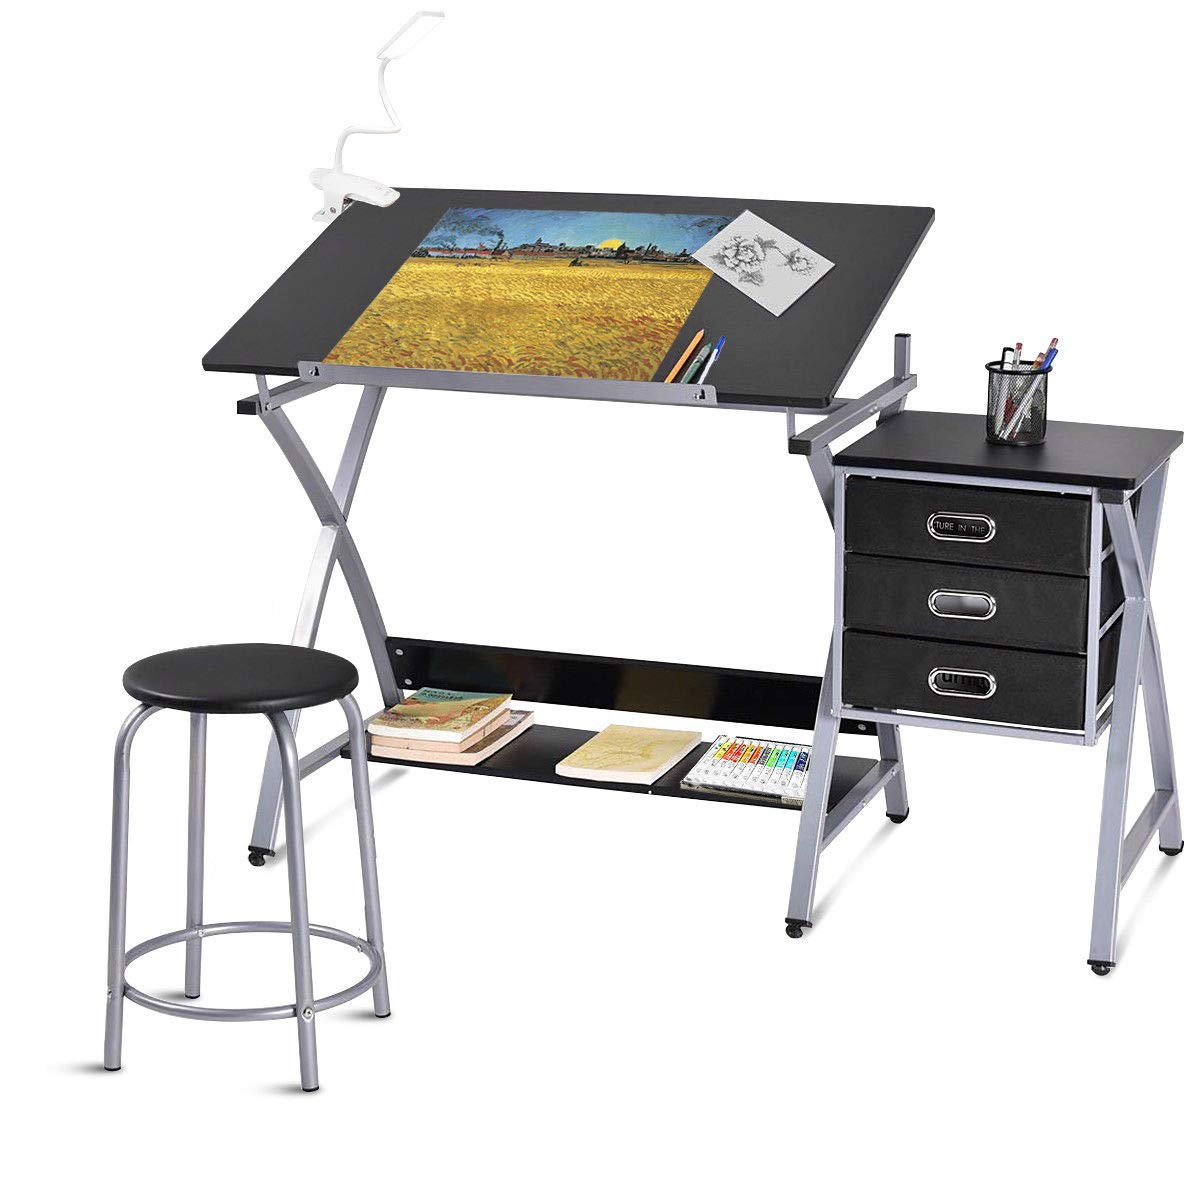 Tangkula Drafting Table Art & Craft Drawing Desk Art Hobby Folding Adjustable w/Stool (Black) by Tangkula